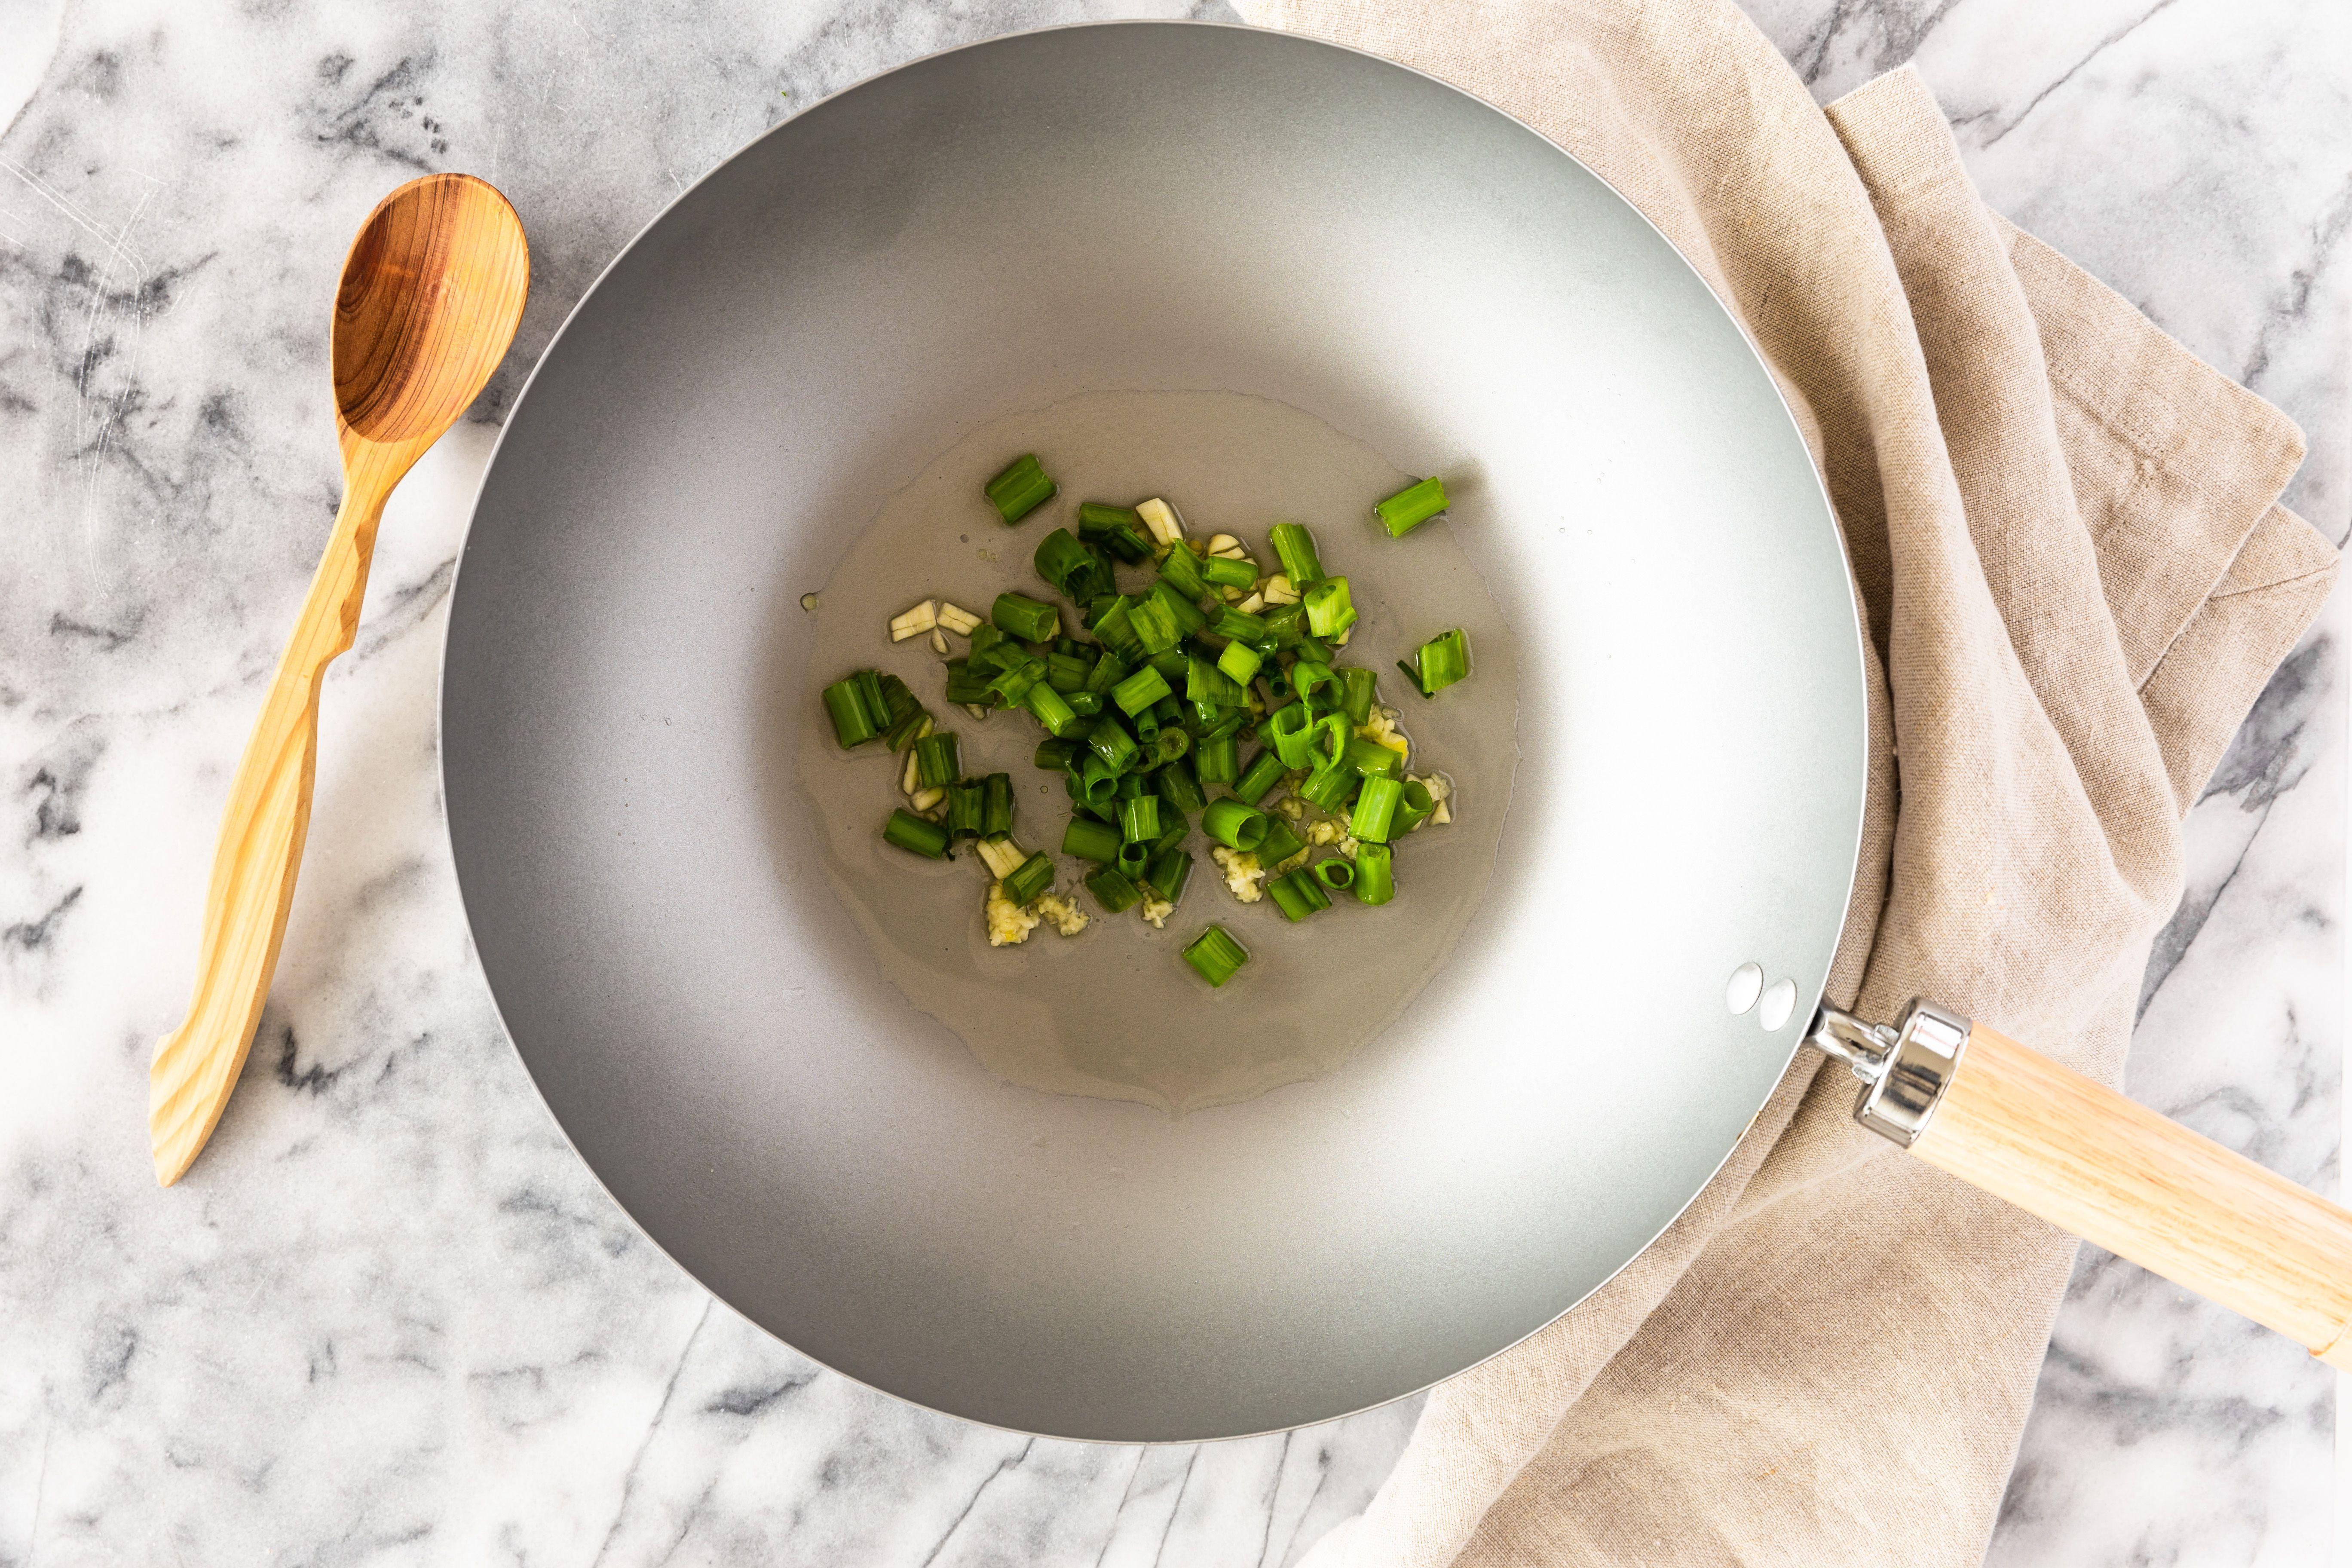 Add green onions